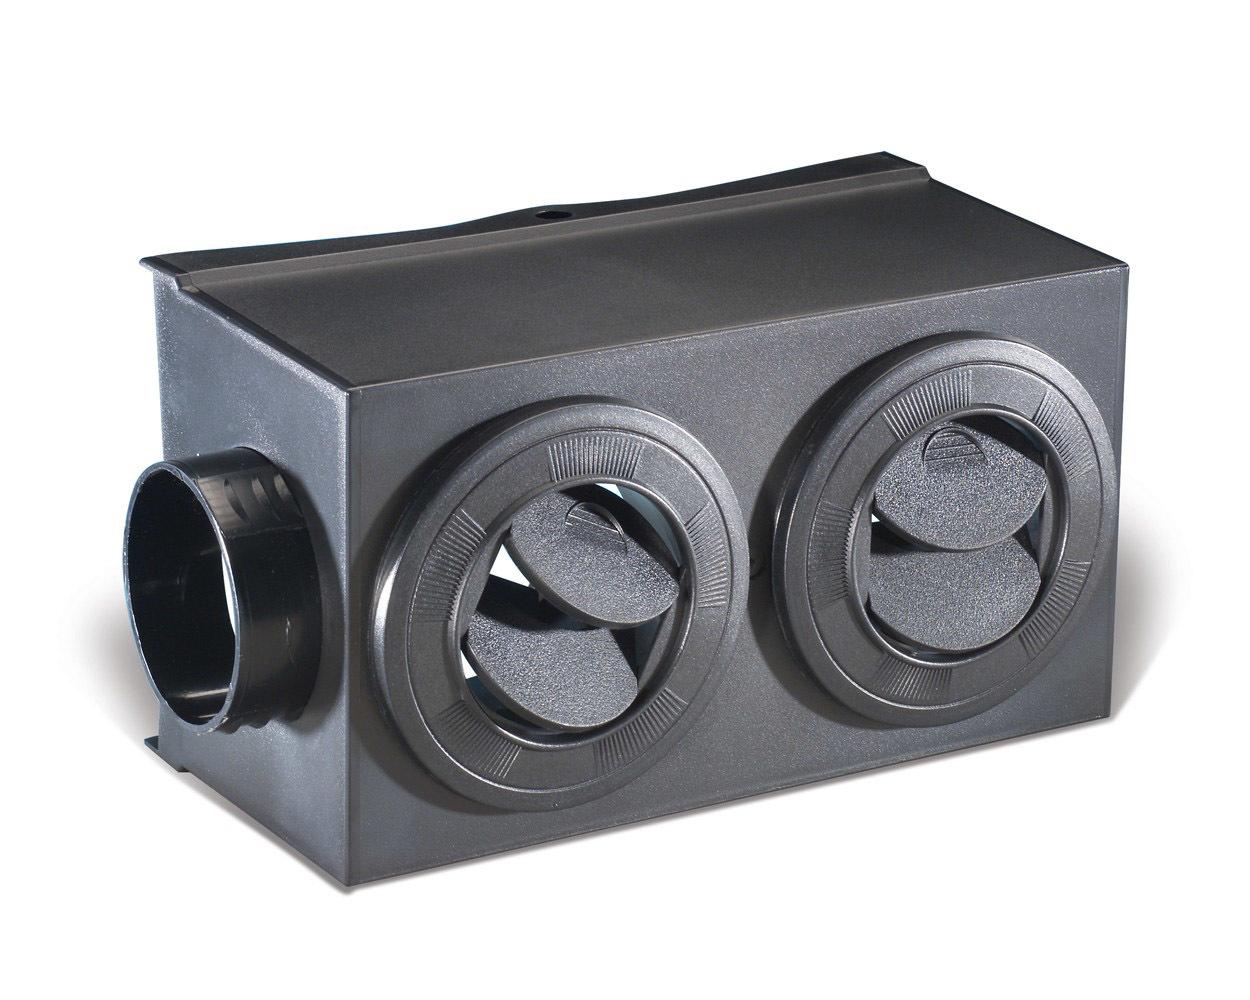 Flex-a-lite Mojave Heater Plenum Box